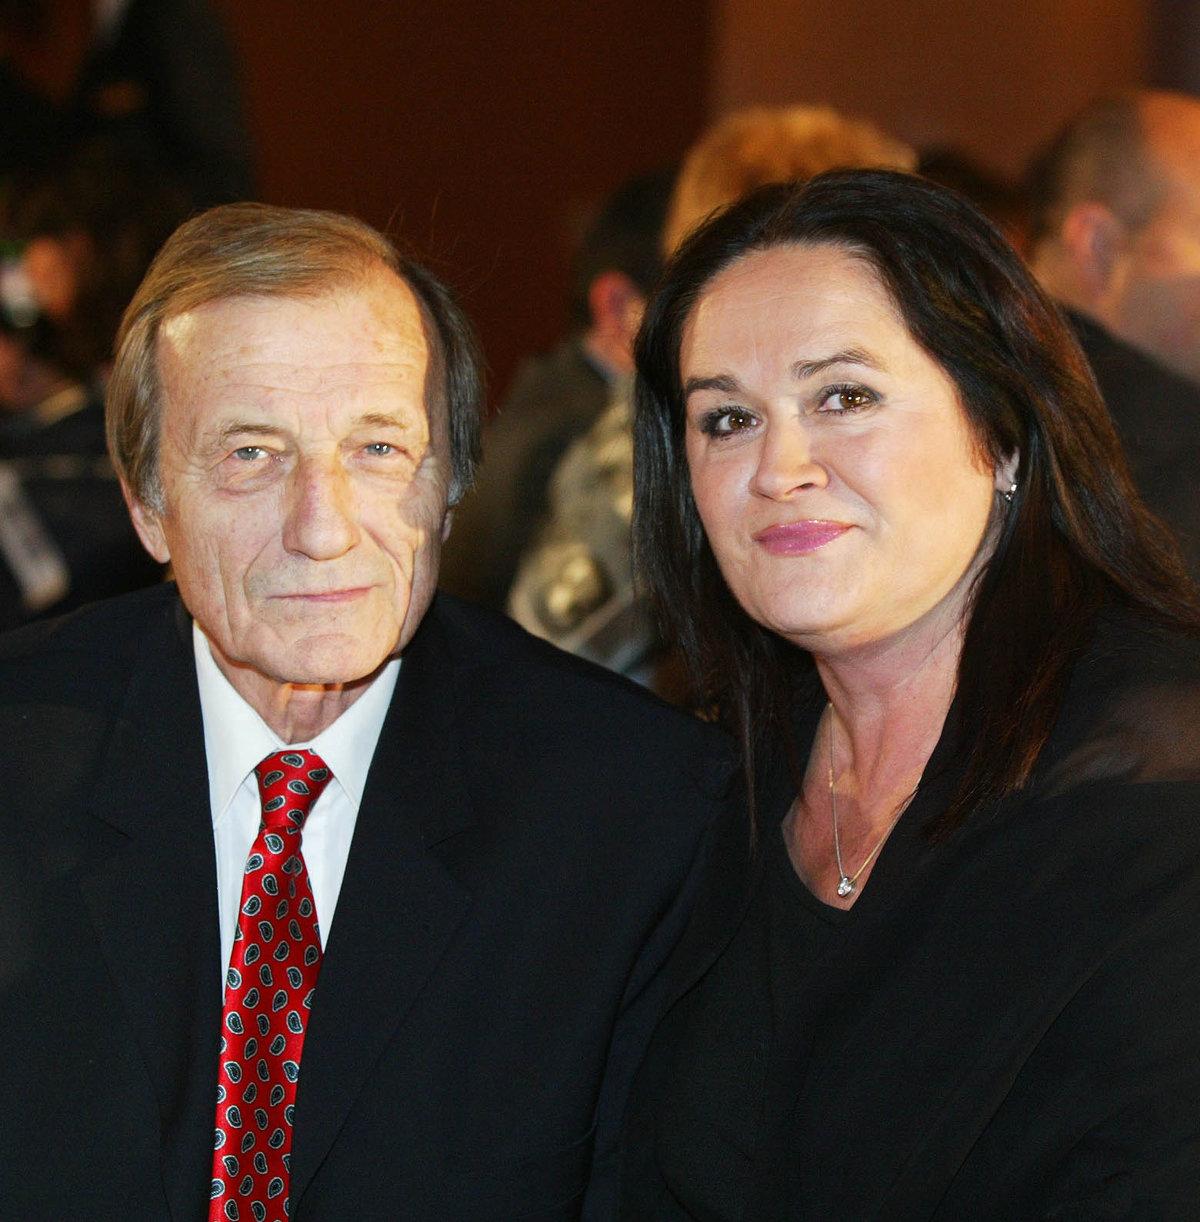 Hana Gregorová a Radek Brzobohatý.